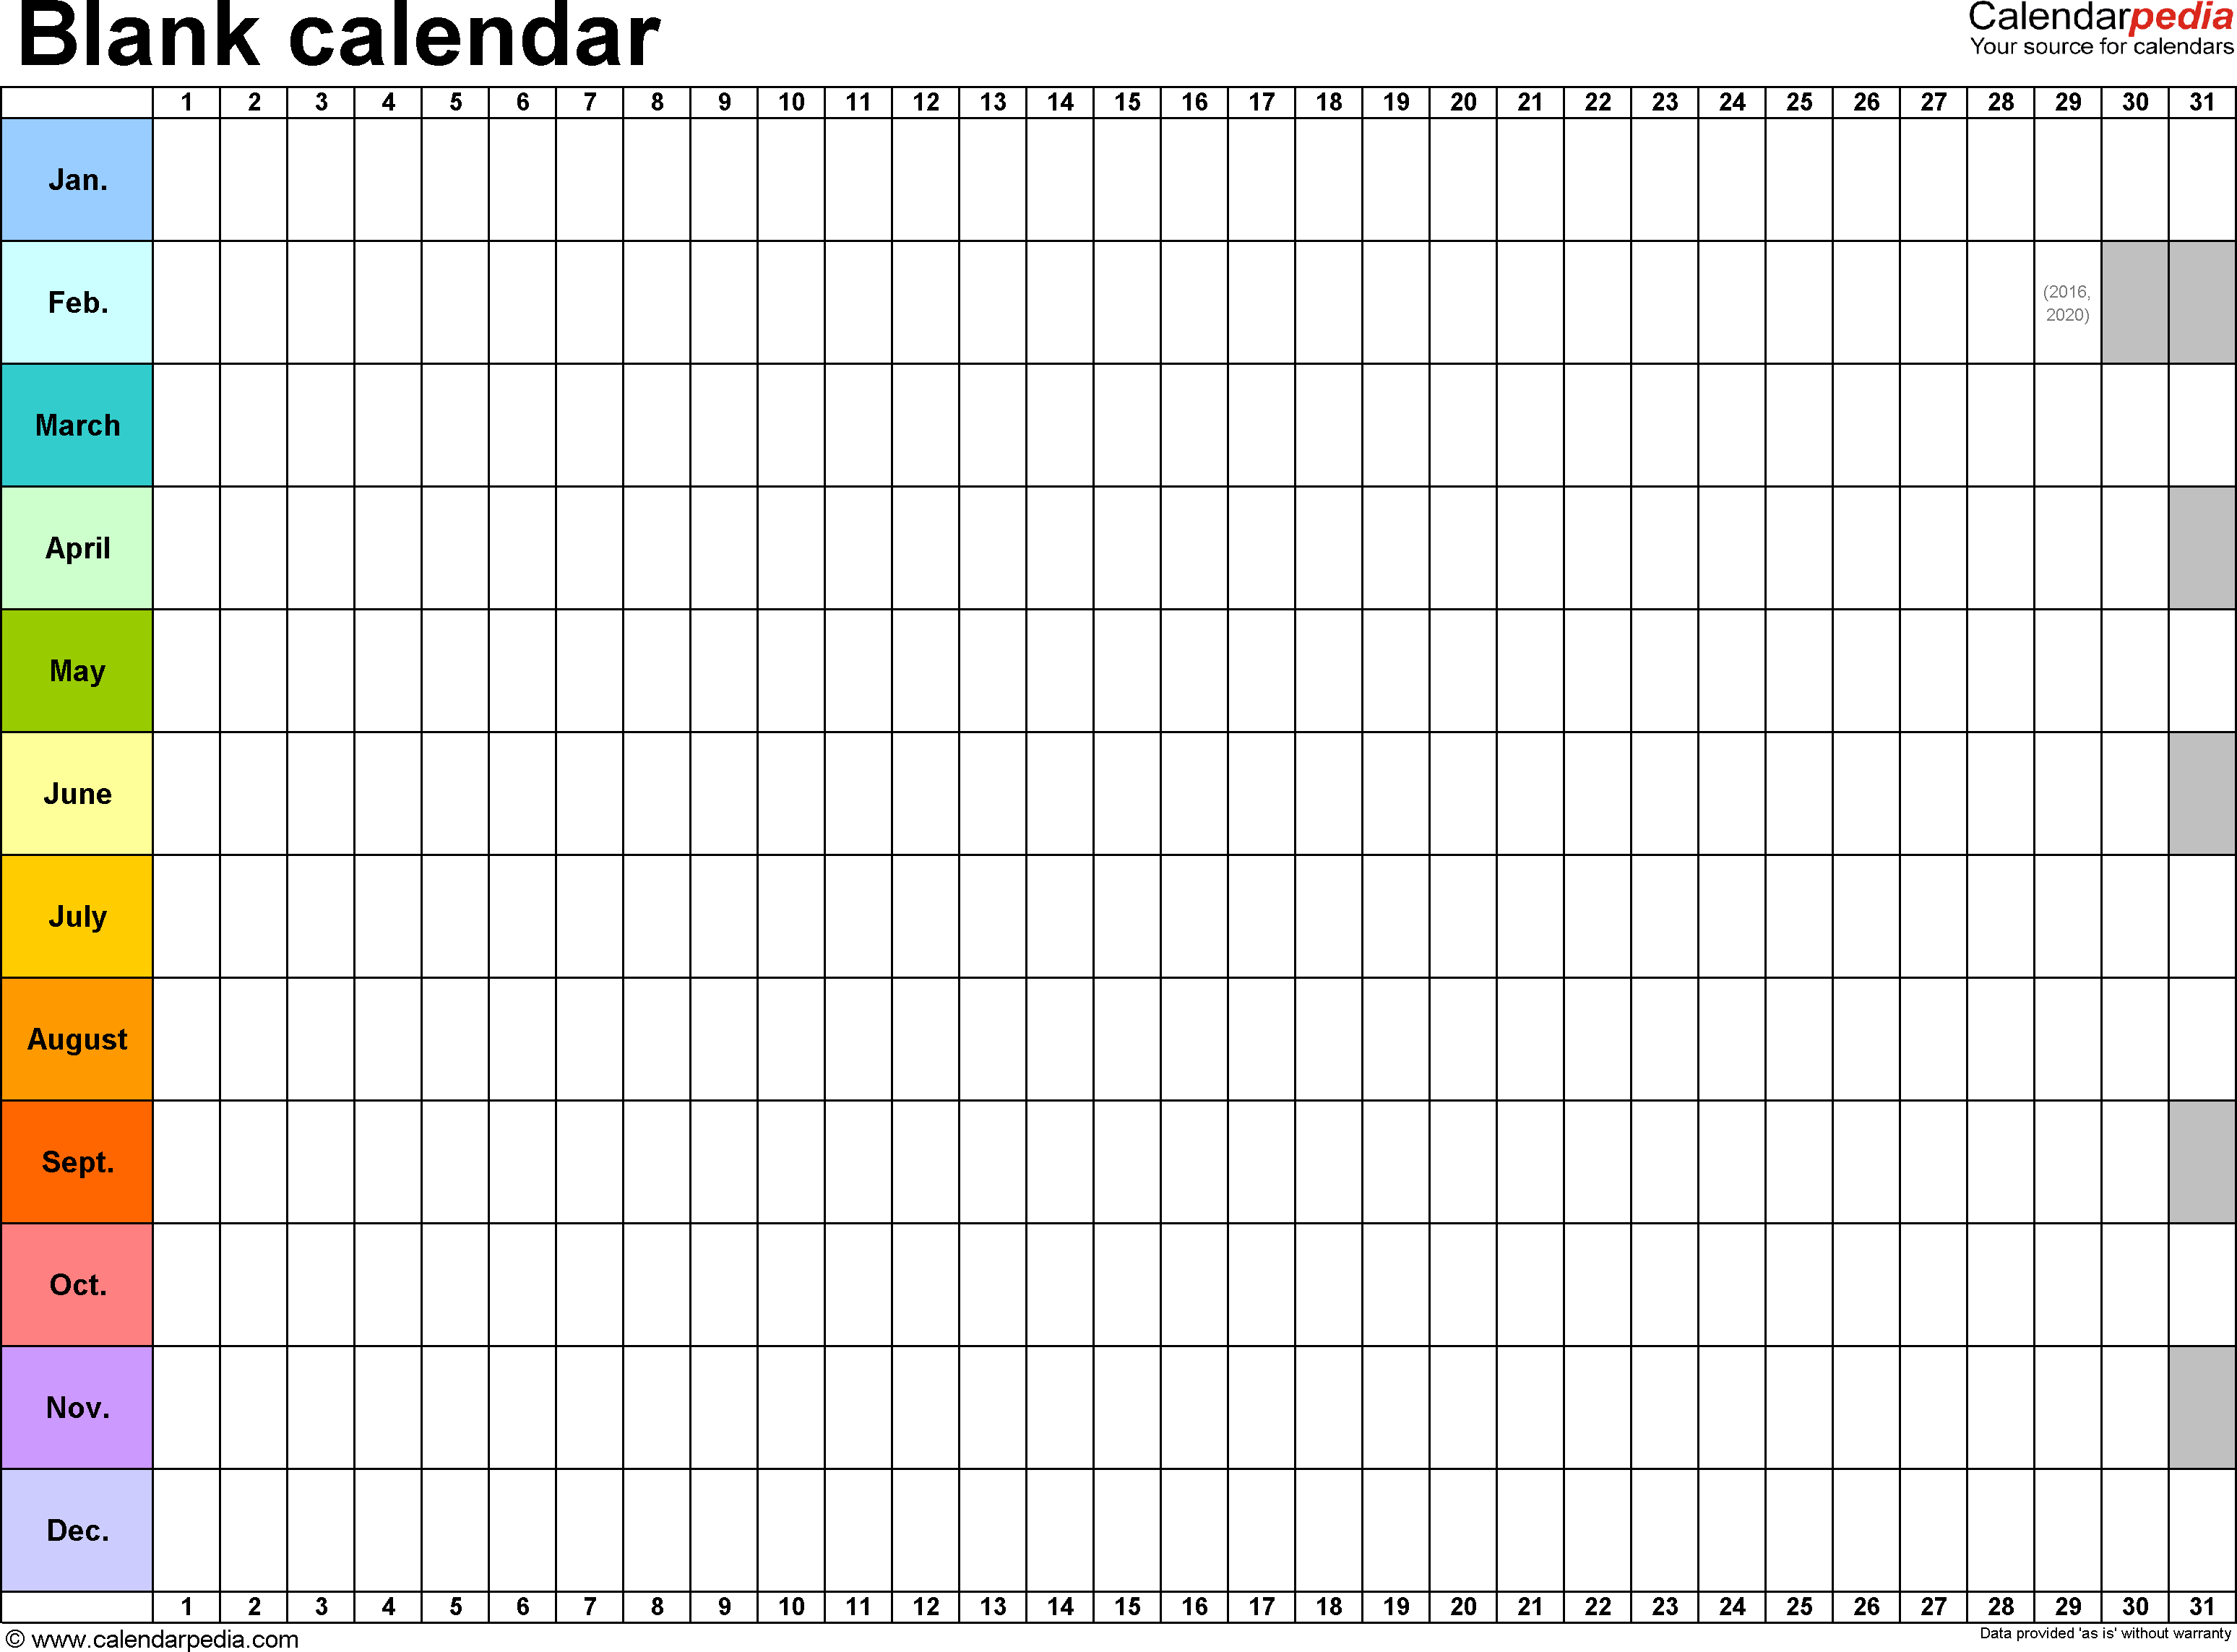 Blank Calendar - 9 Free Printable Microsoft Word Templates inside Free Printable Blank Calendars To Fill In